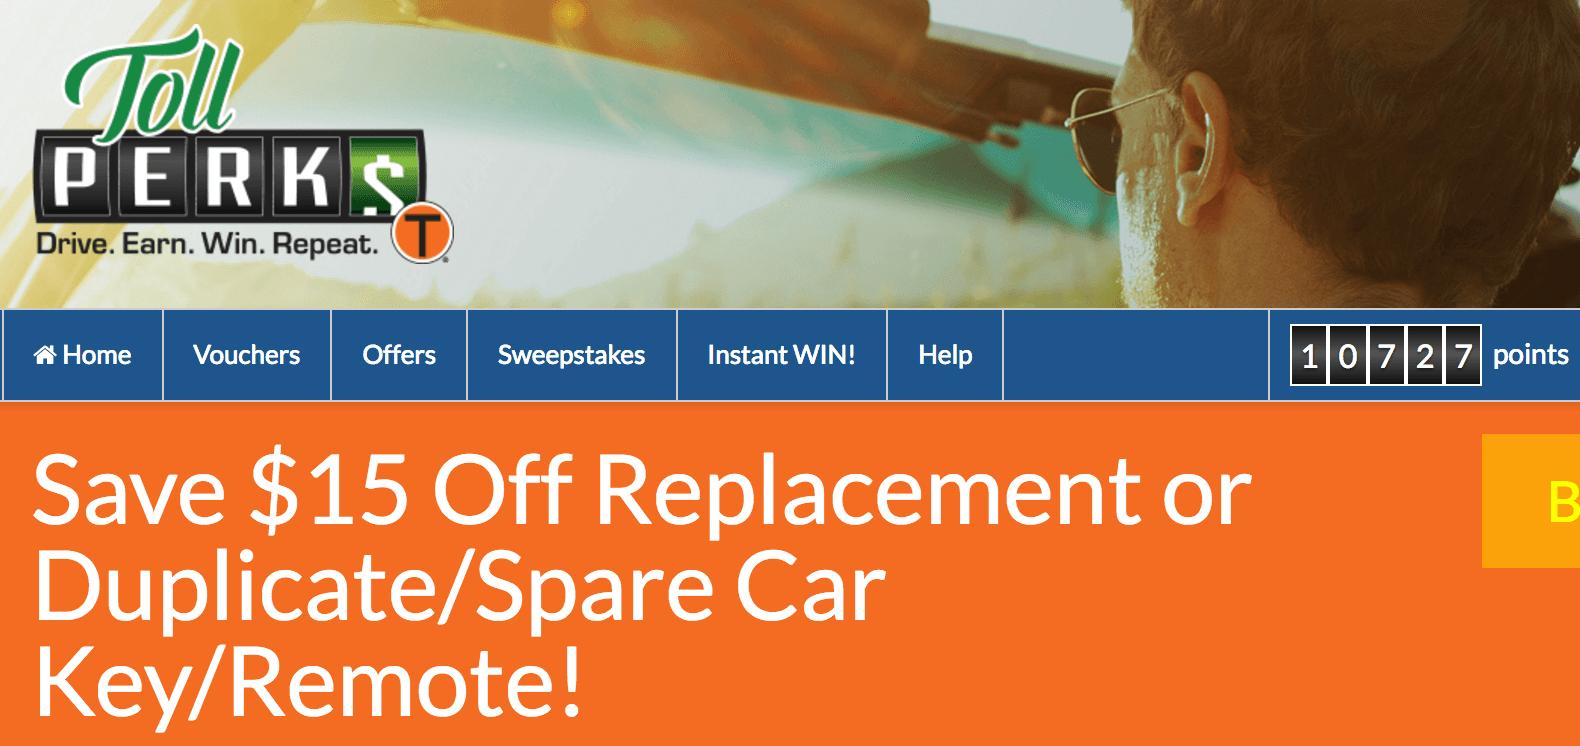 Pop A Lock Locksmith Auto Home Business & Roadside Help